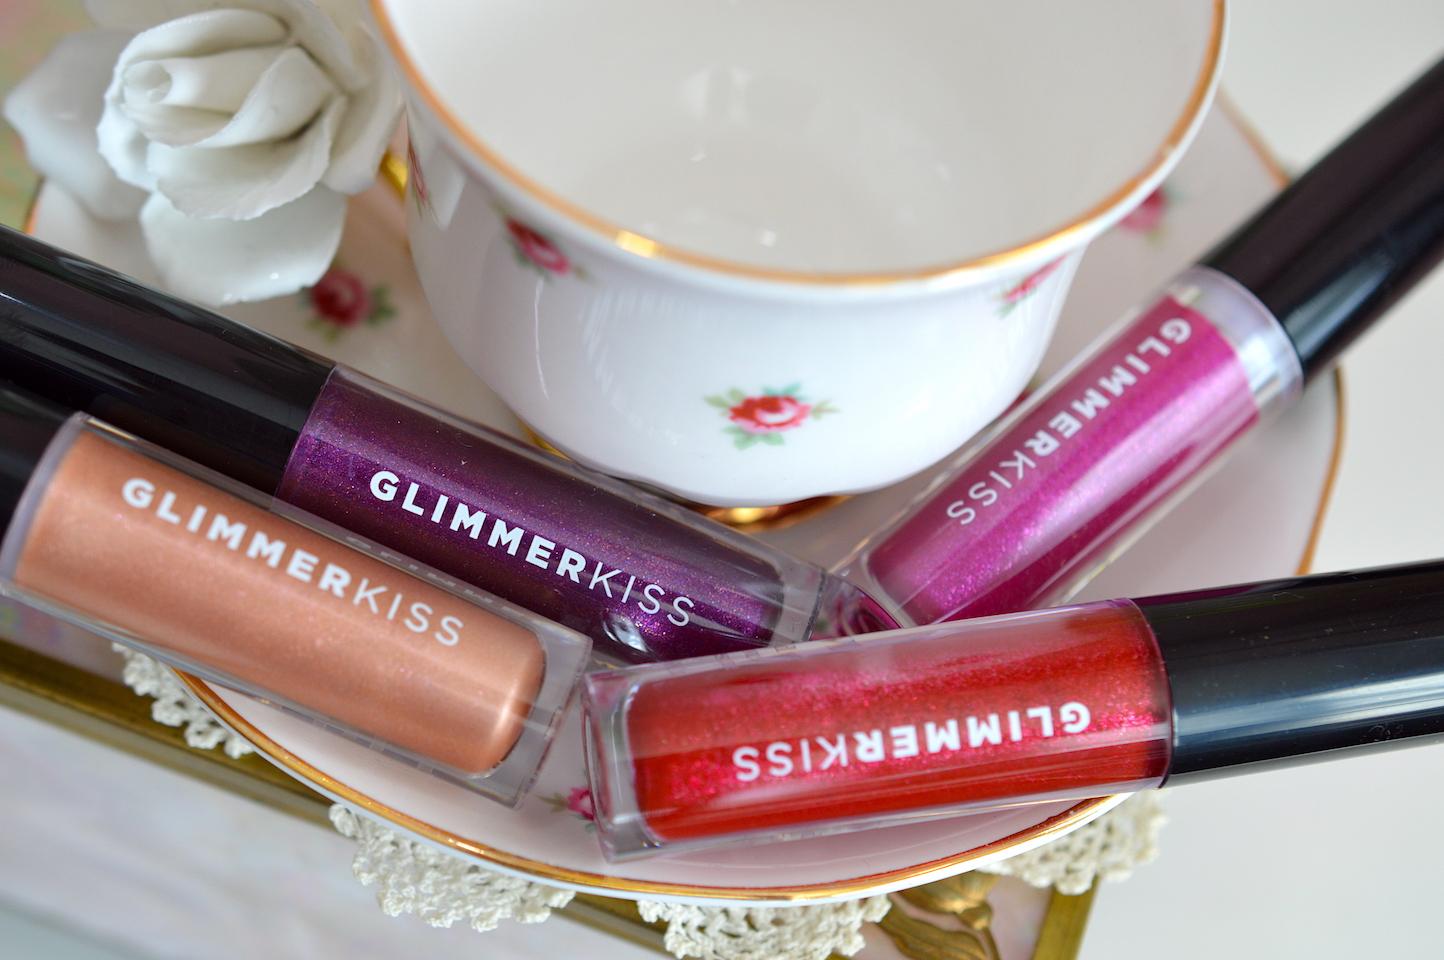 AVON Glimmerkiss Liquid Lipstick